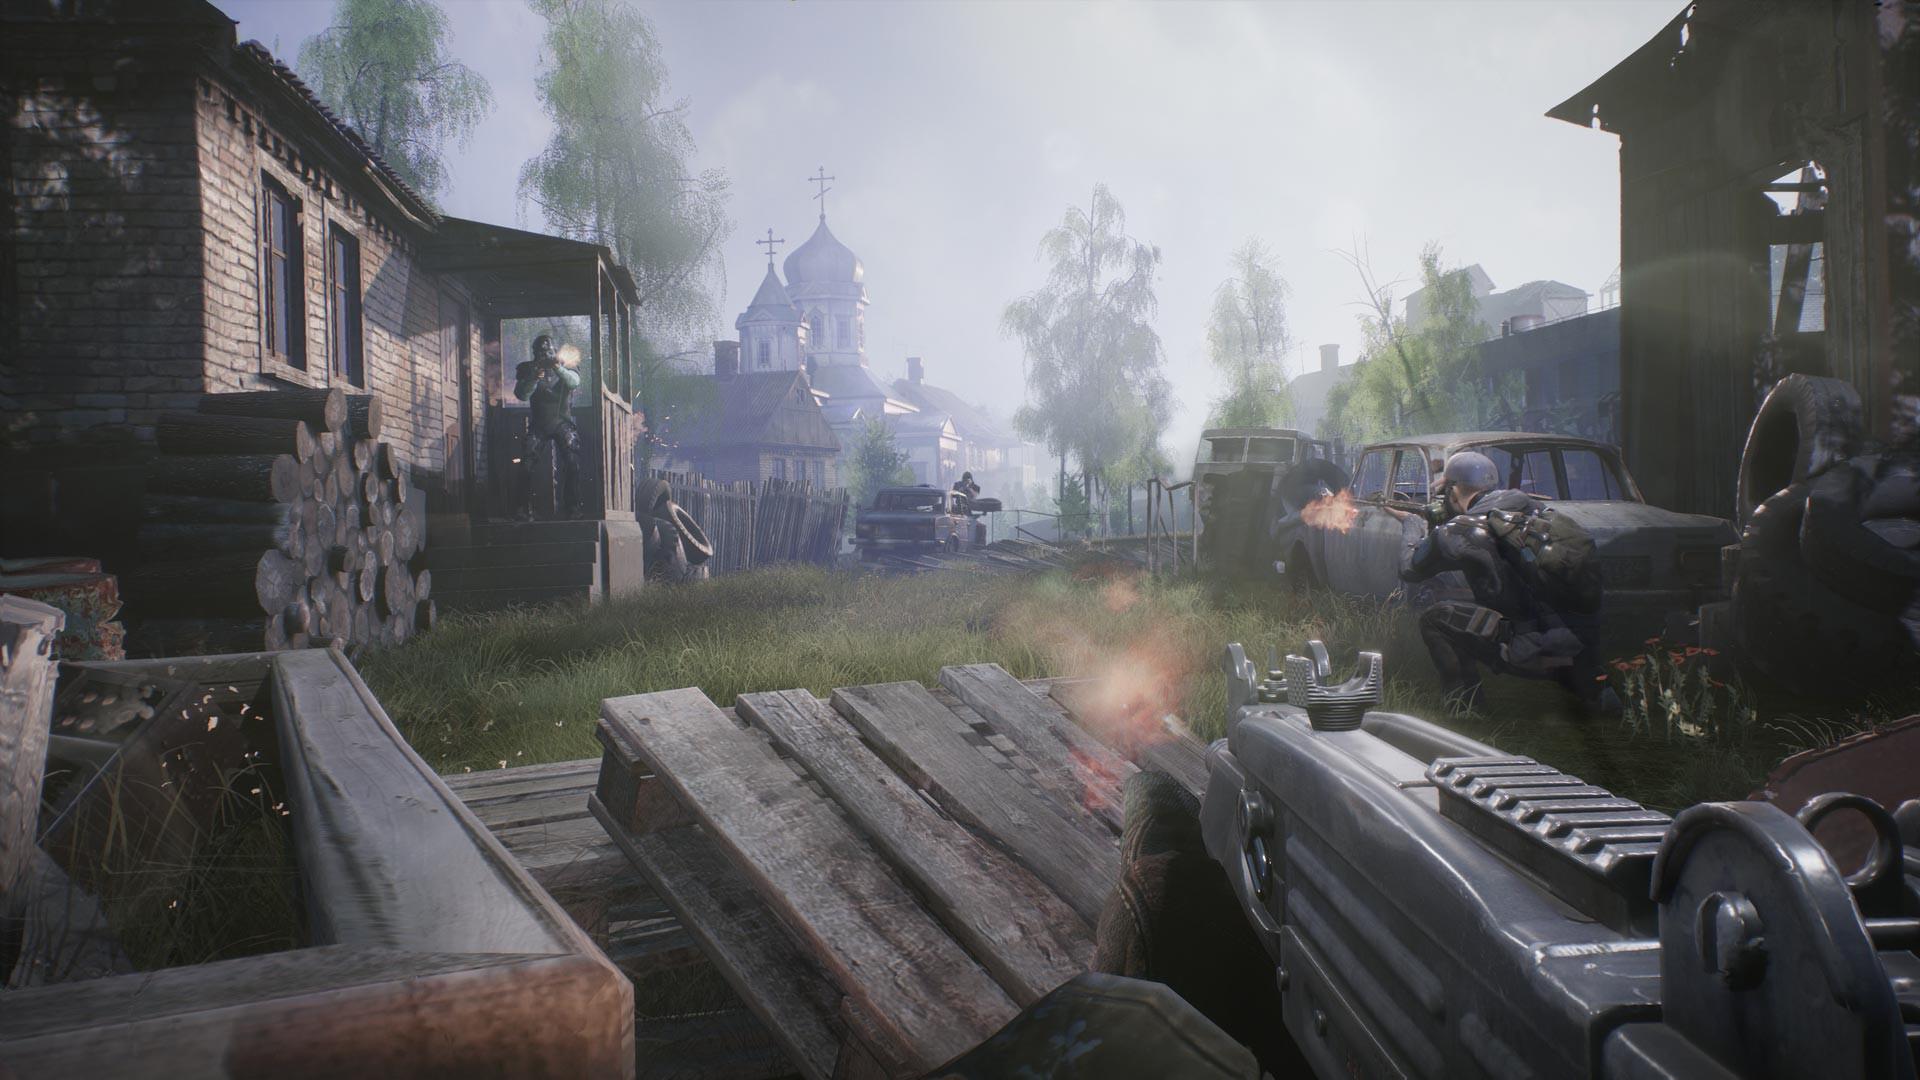 Microsoft Ukraine and Nravo Kids have released a development mini-game